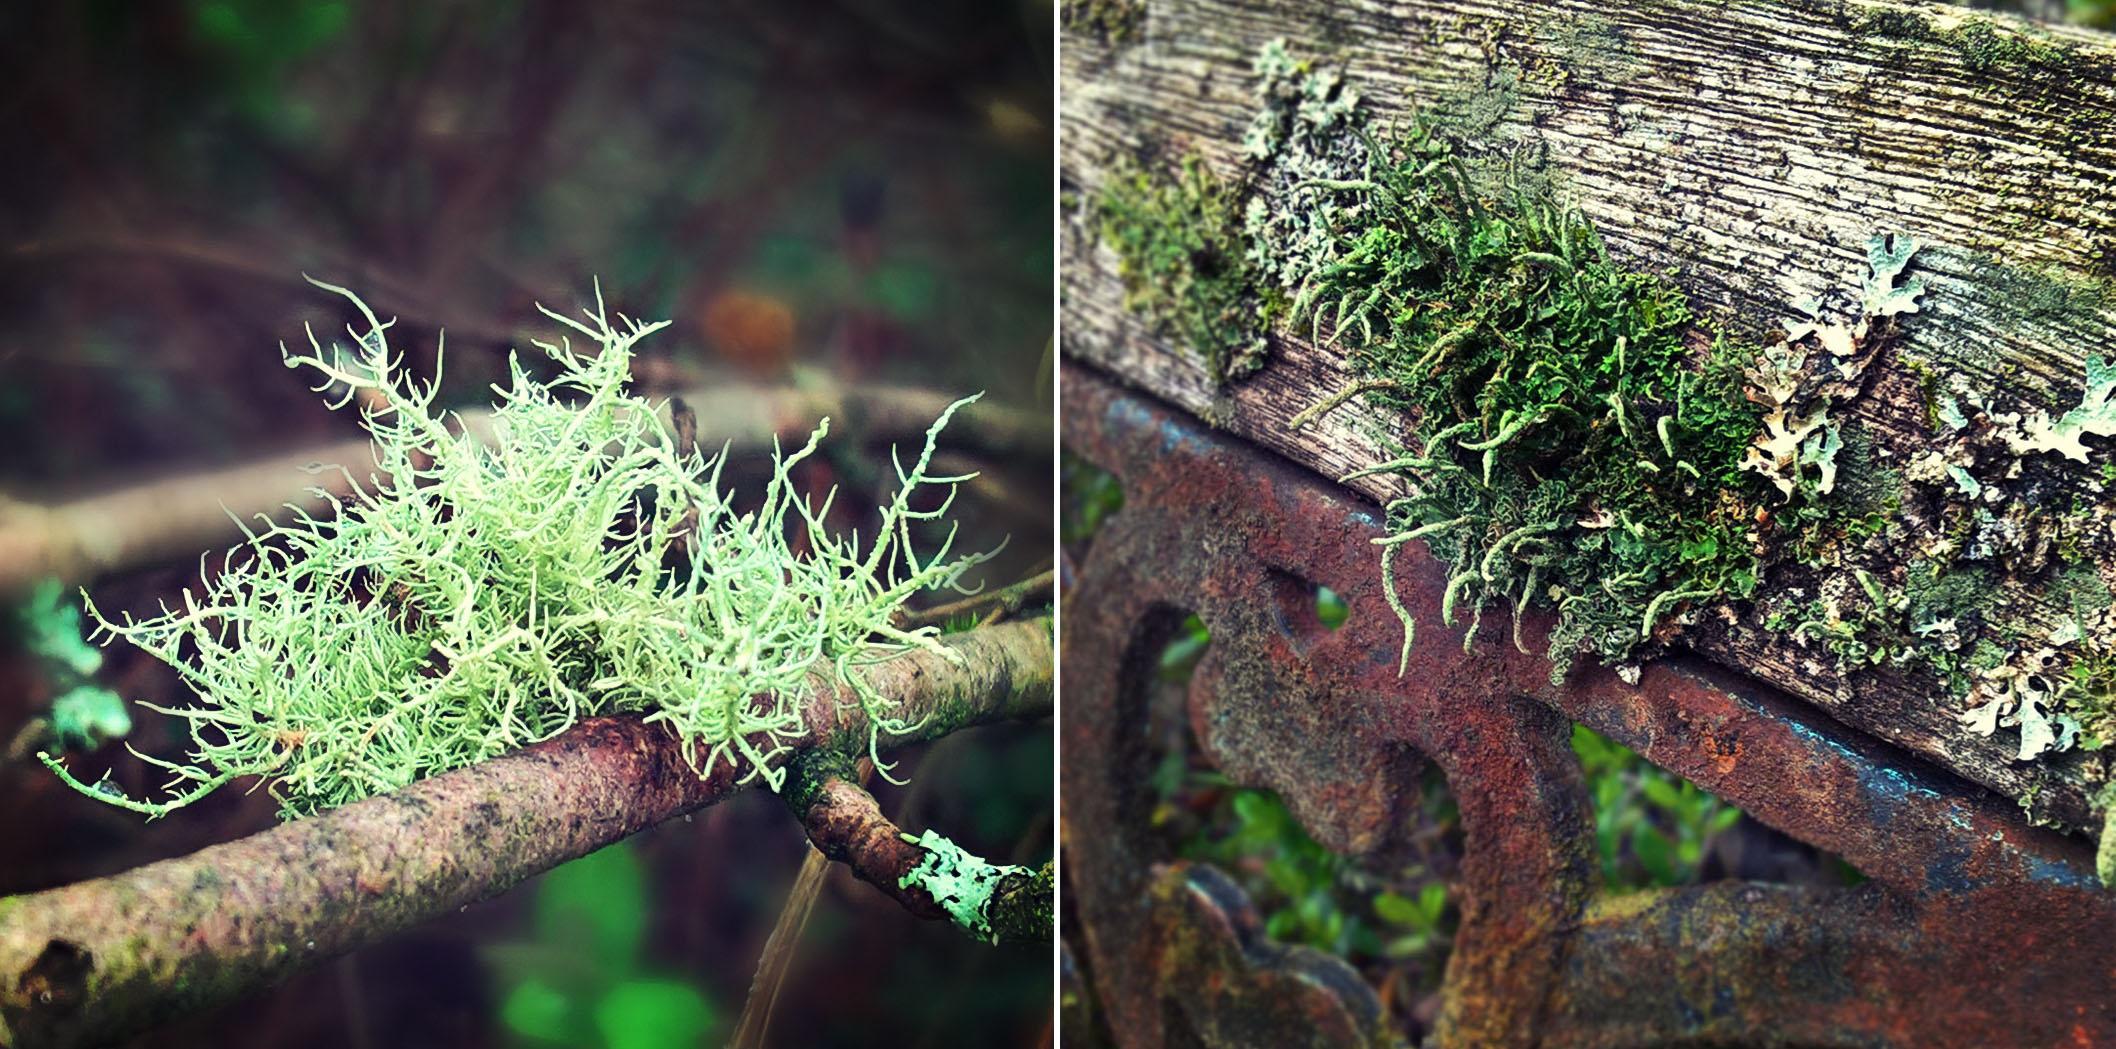 Foliose-lichen-branch-rusty-wooden-seat-The-Last-Krystallos